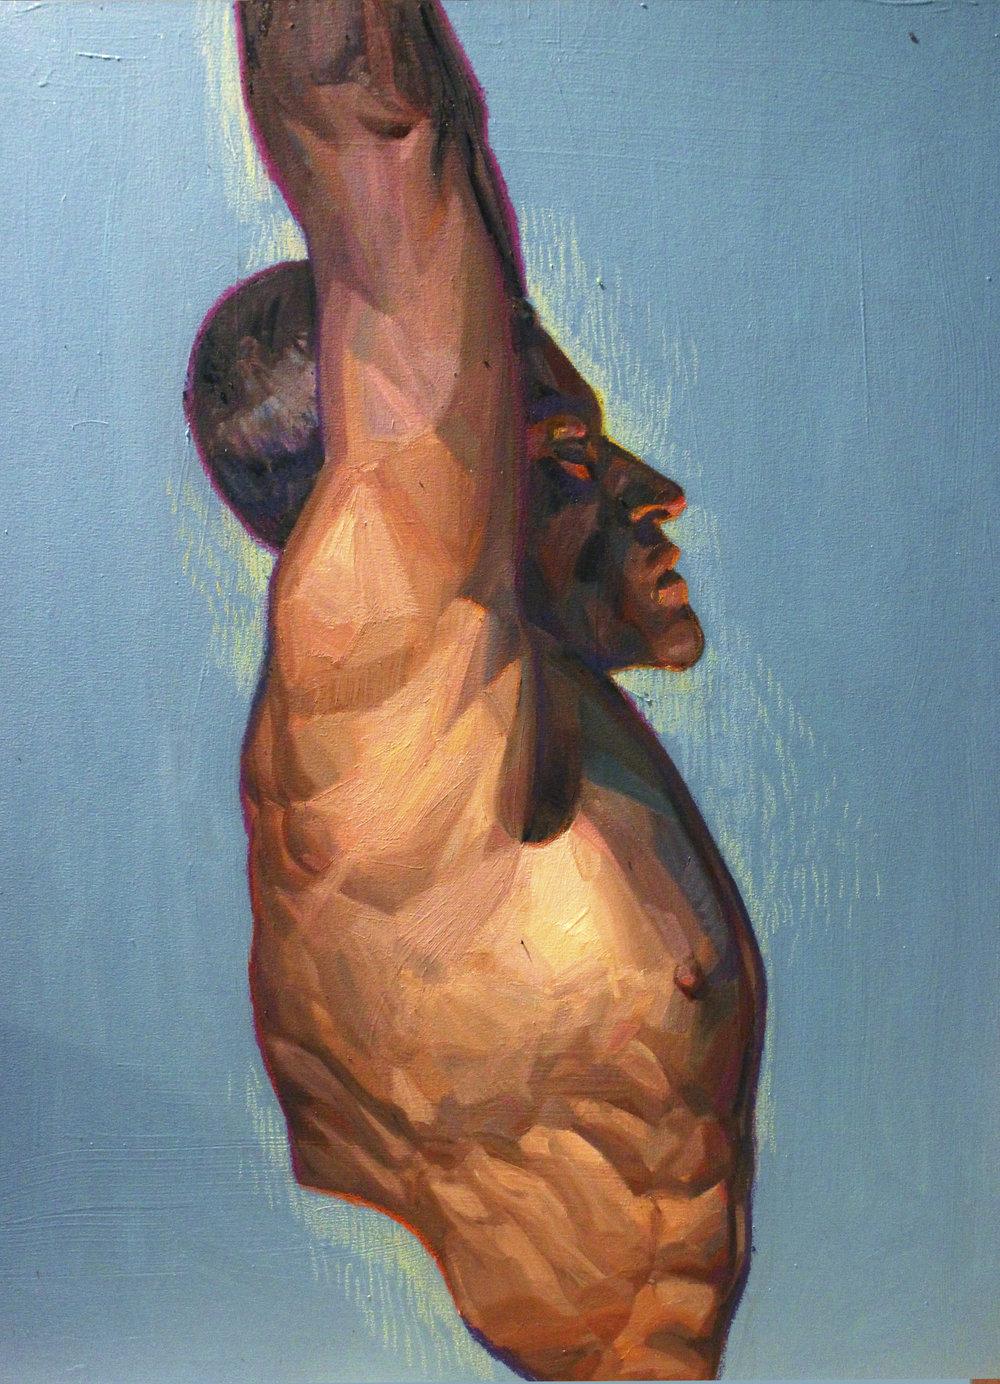 Blue 1: 102cm x 120cm oil paint and oil pastel on canvas